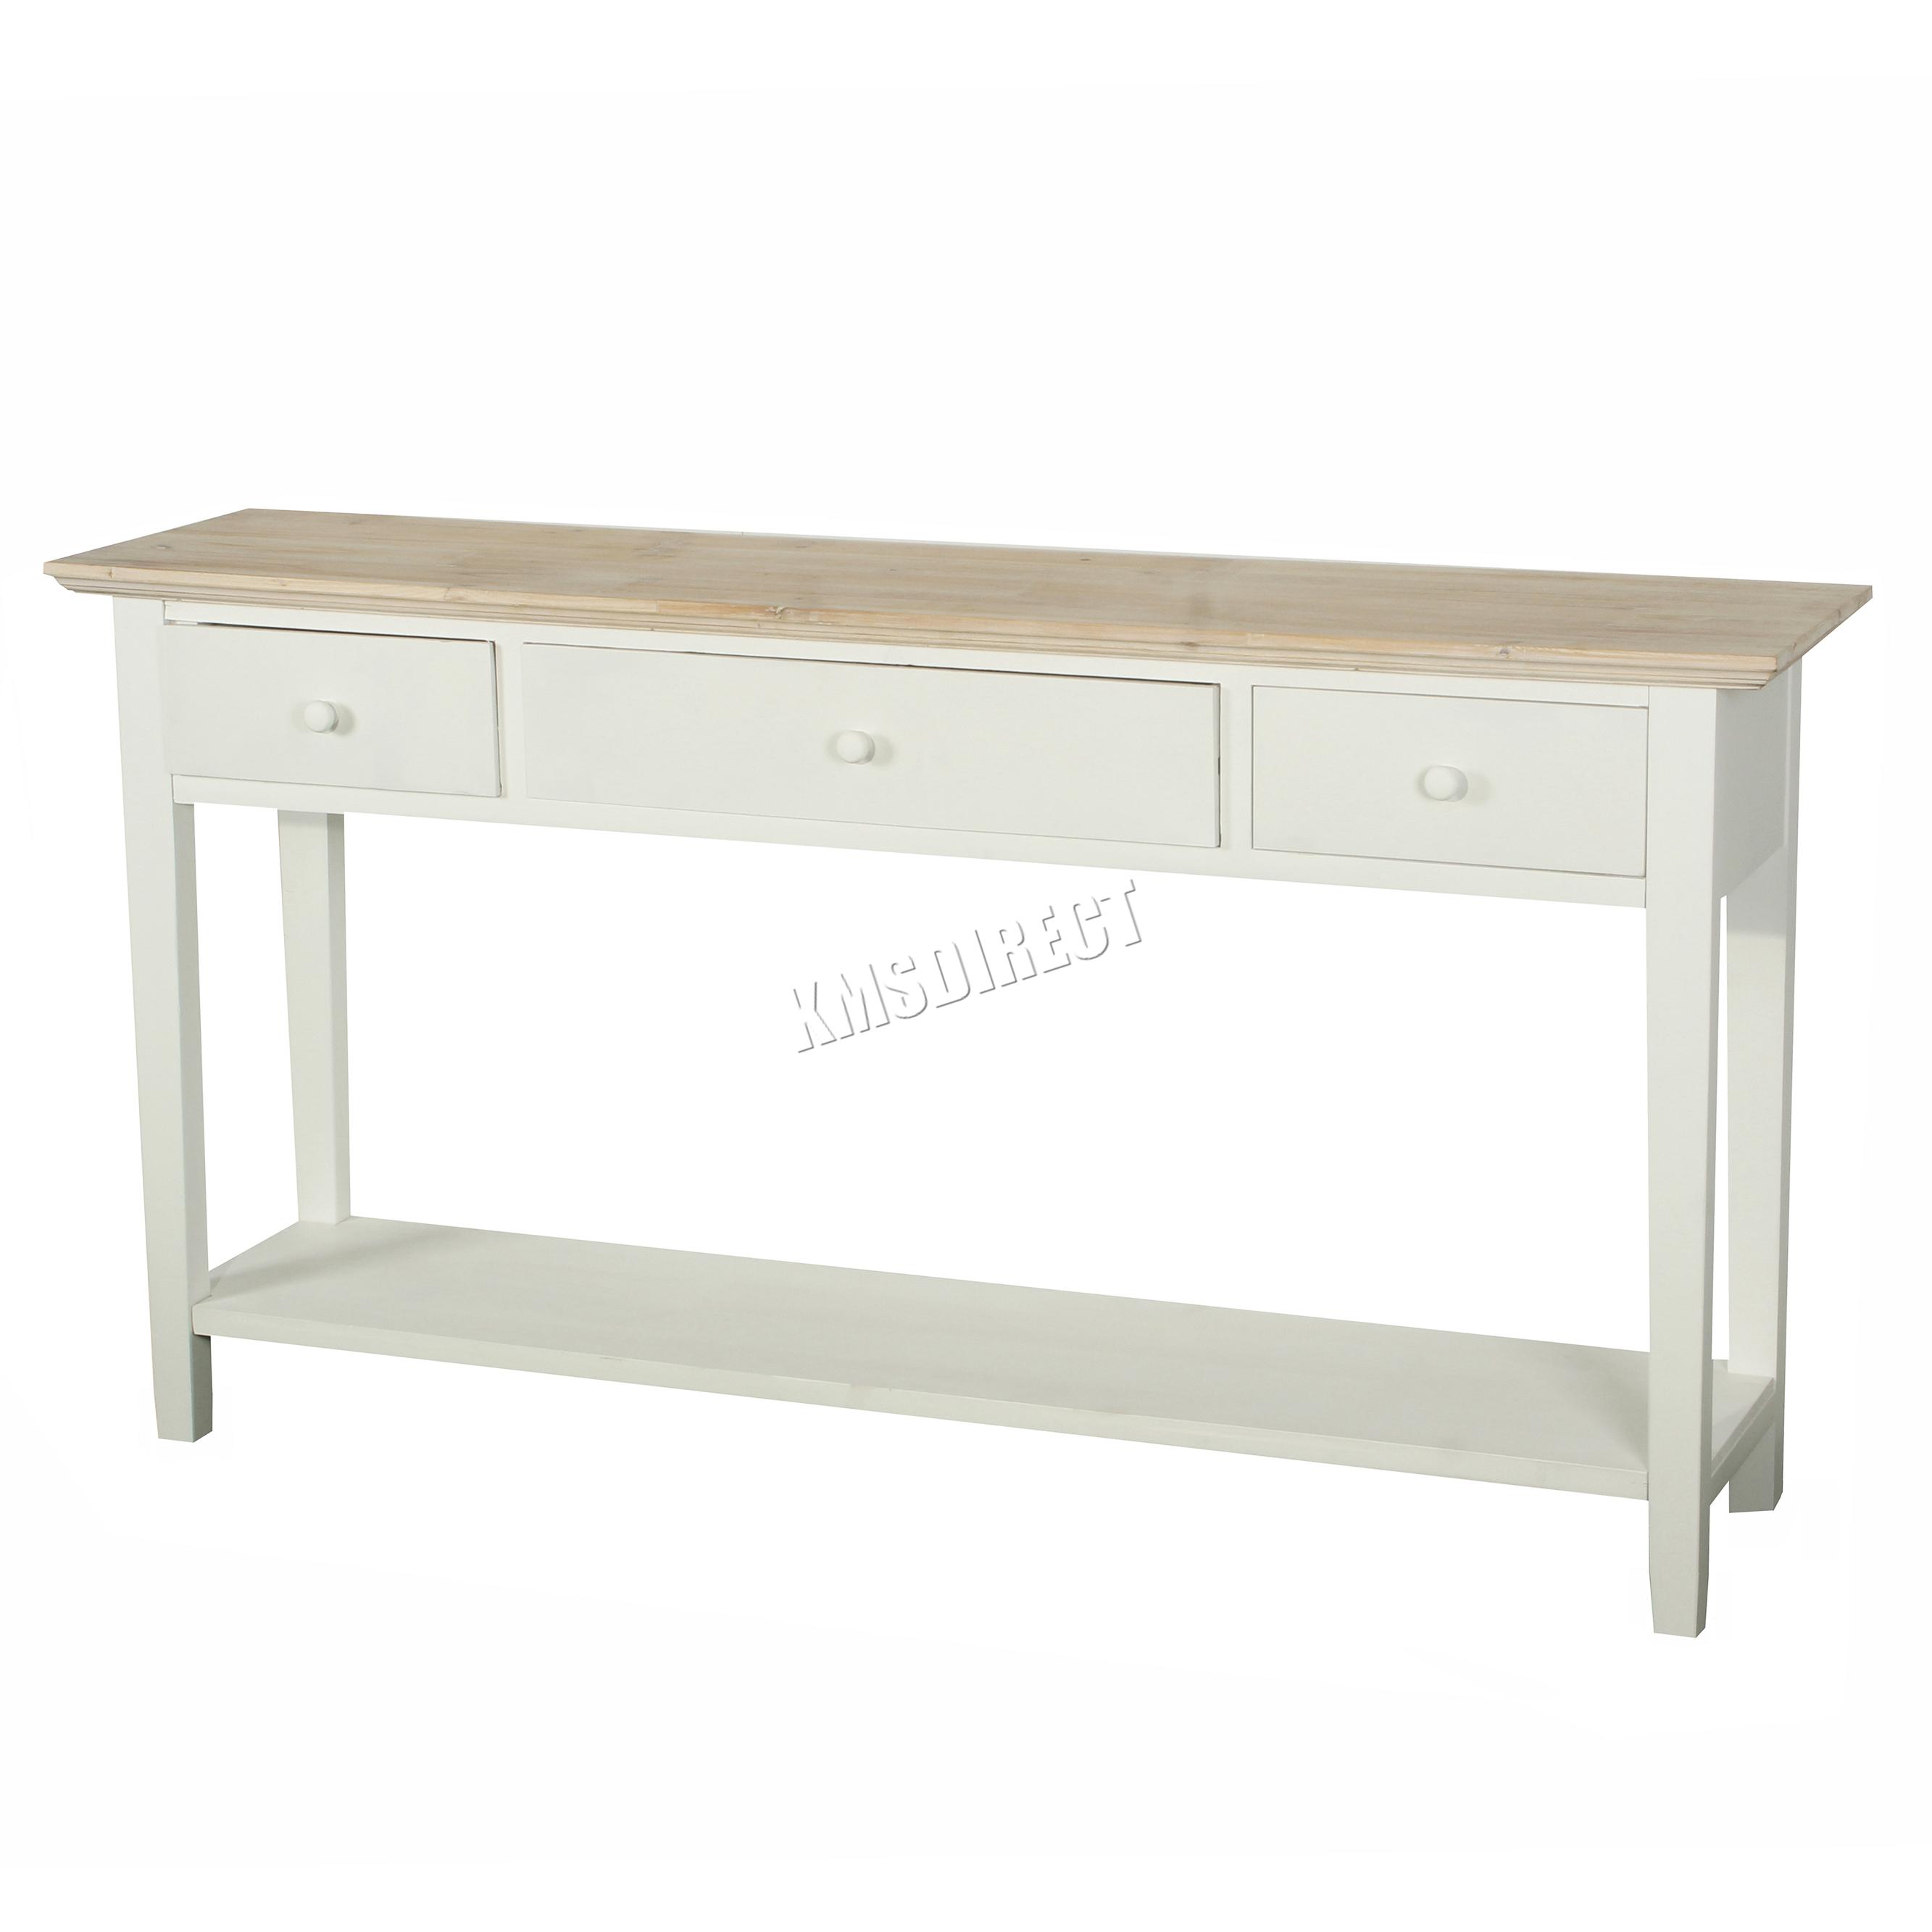 Foxhunter Console Table 3 Drawers Wood Hallway Side Storage Hall Kitchen Ctw02 Ebay